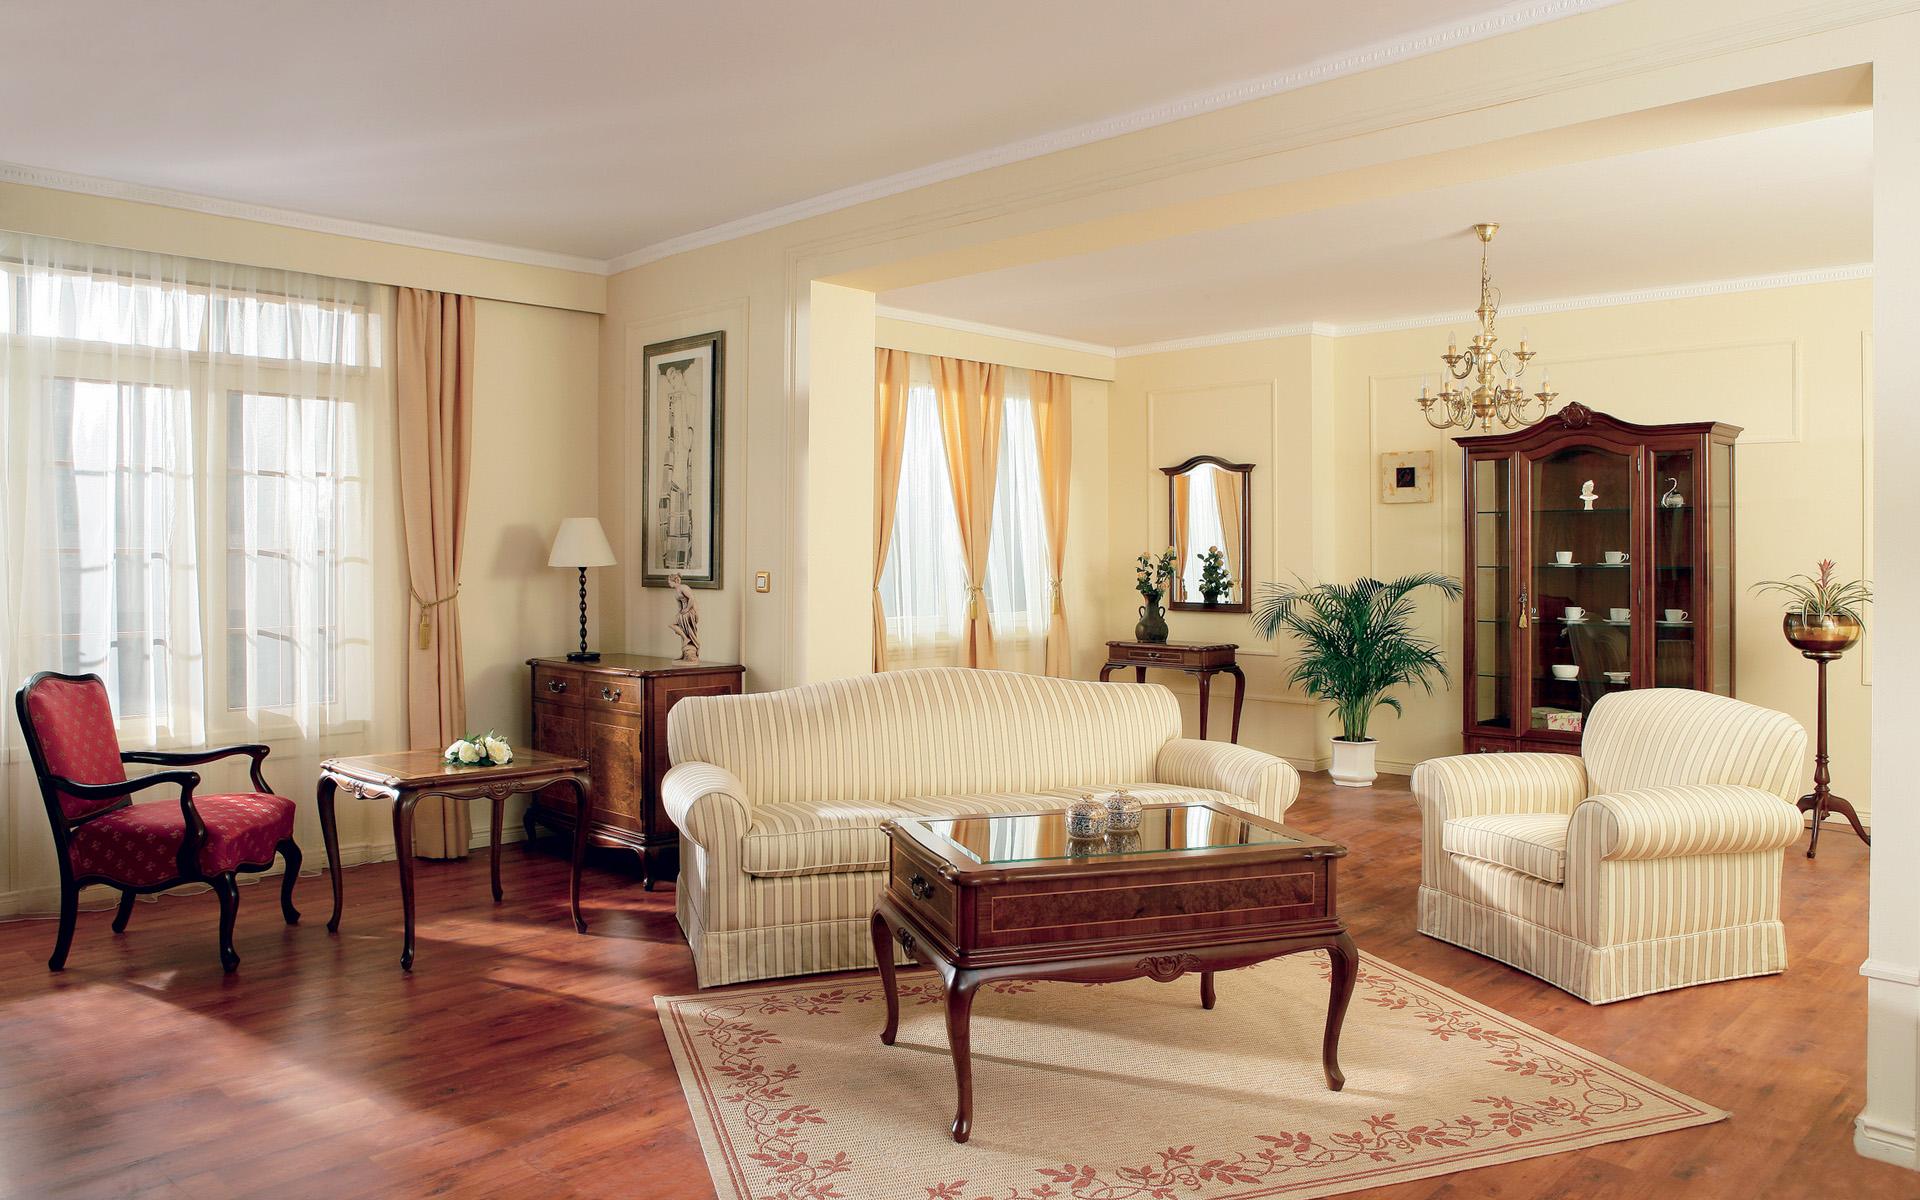 dnevna-soba_day-room_Wohnzimmer_Barocco_klasicno-pohistvo_classic-furniture_Klassischen-Moebel